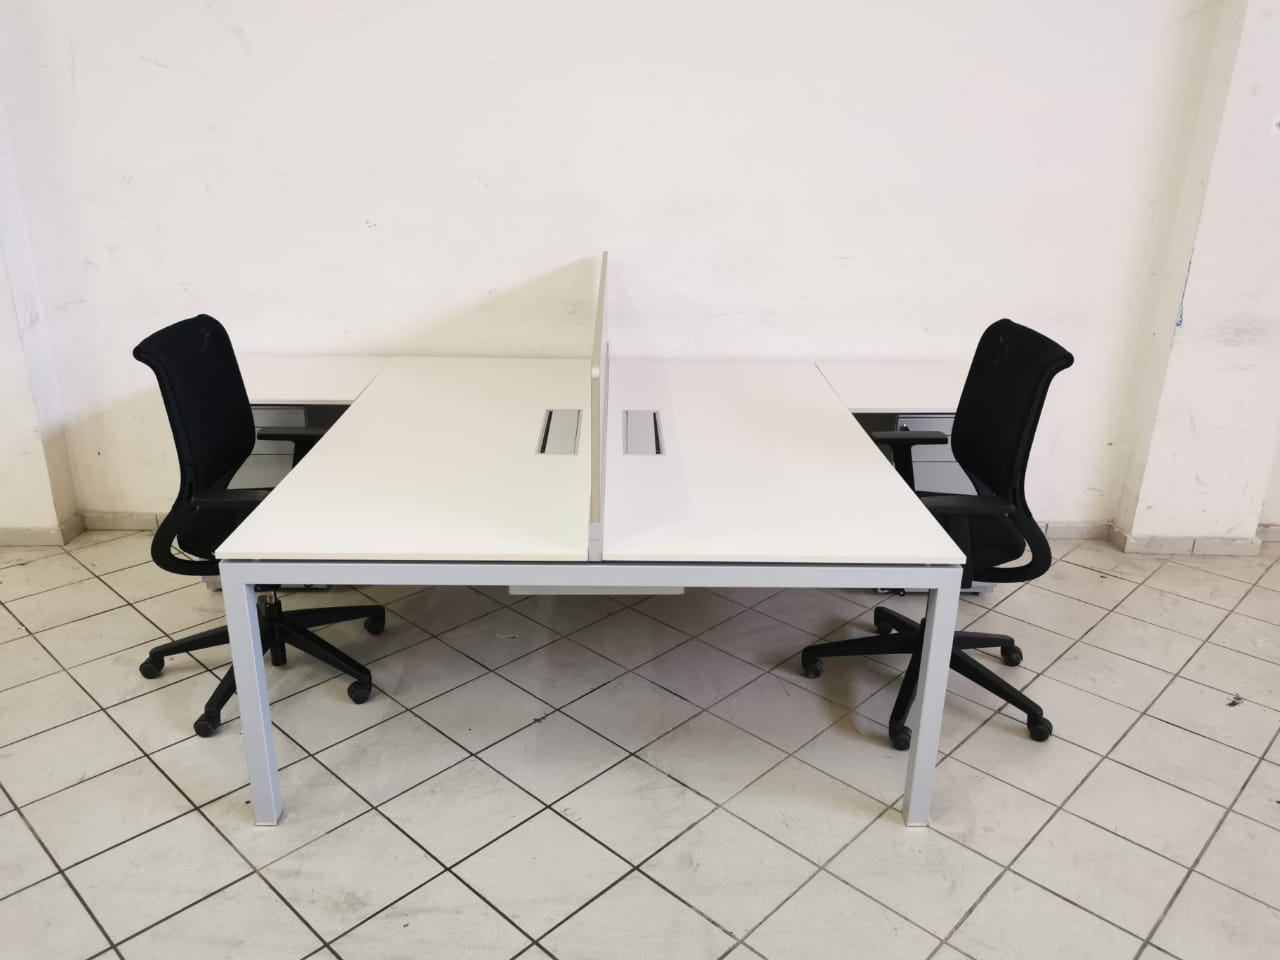 Ensemble bench Haworth 180×80 avec caisson 3T chaise